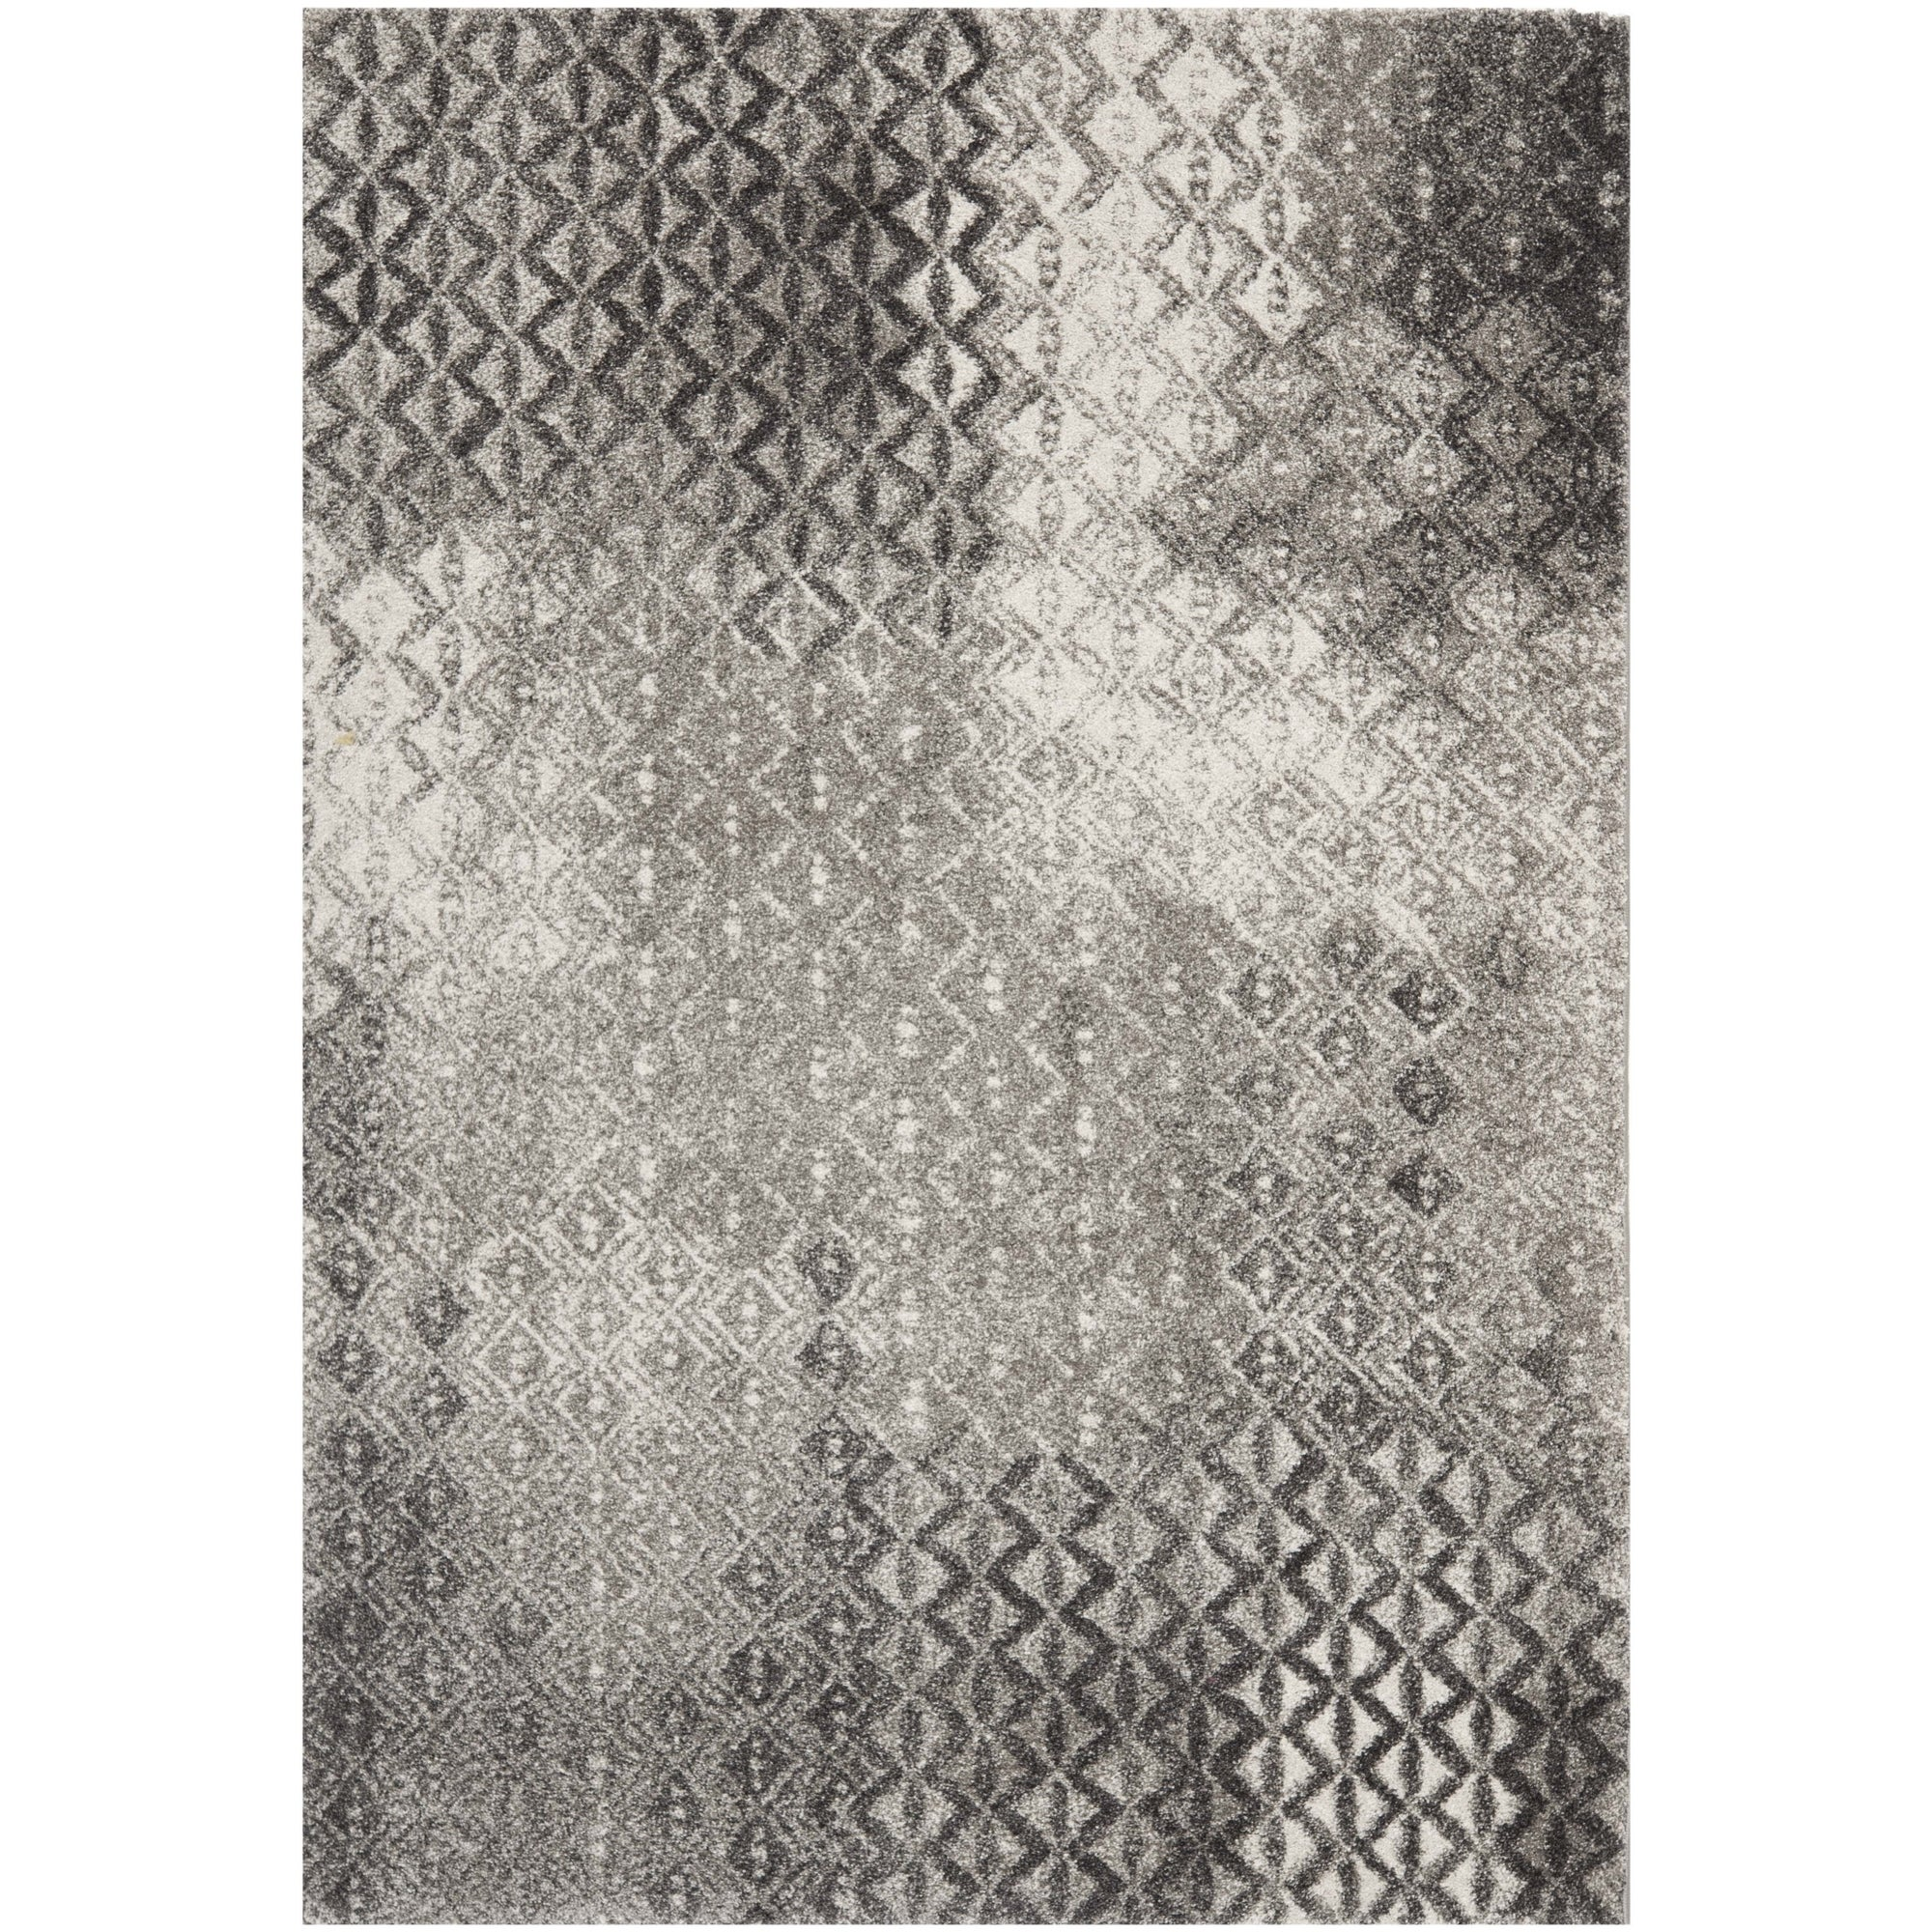 "Safavieh Porcello Contemporary Gray/Black Rug (8' x 11'2"") at Sears.com"